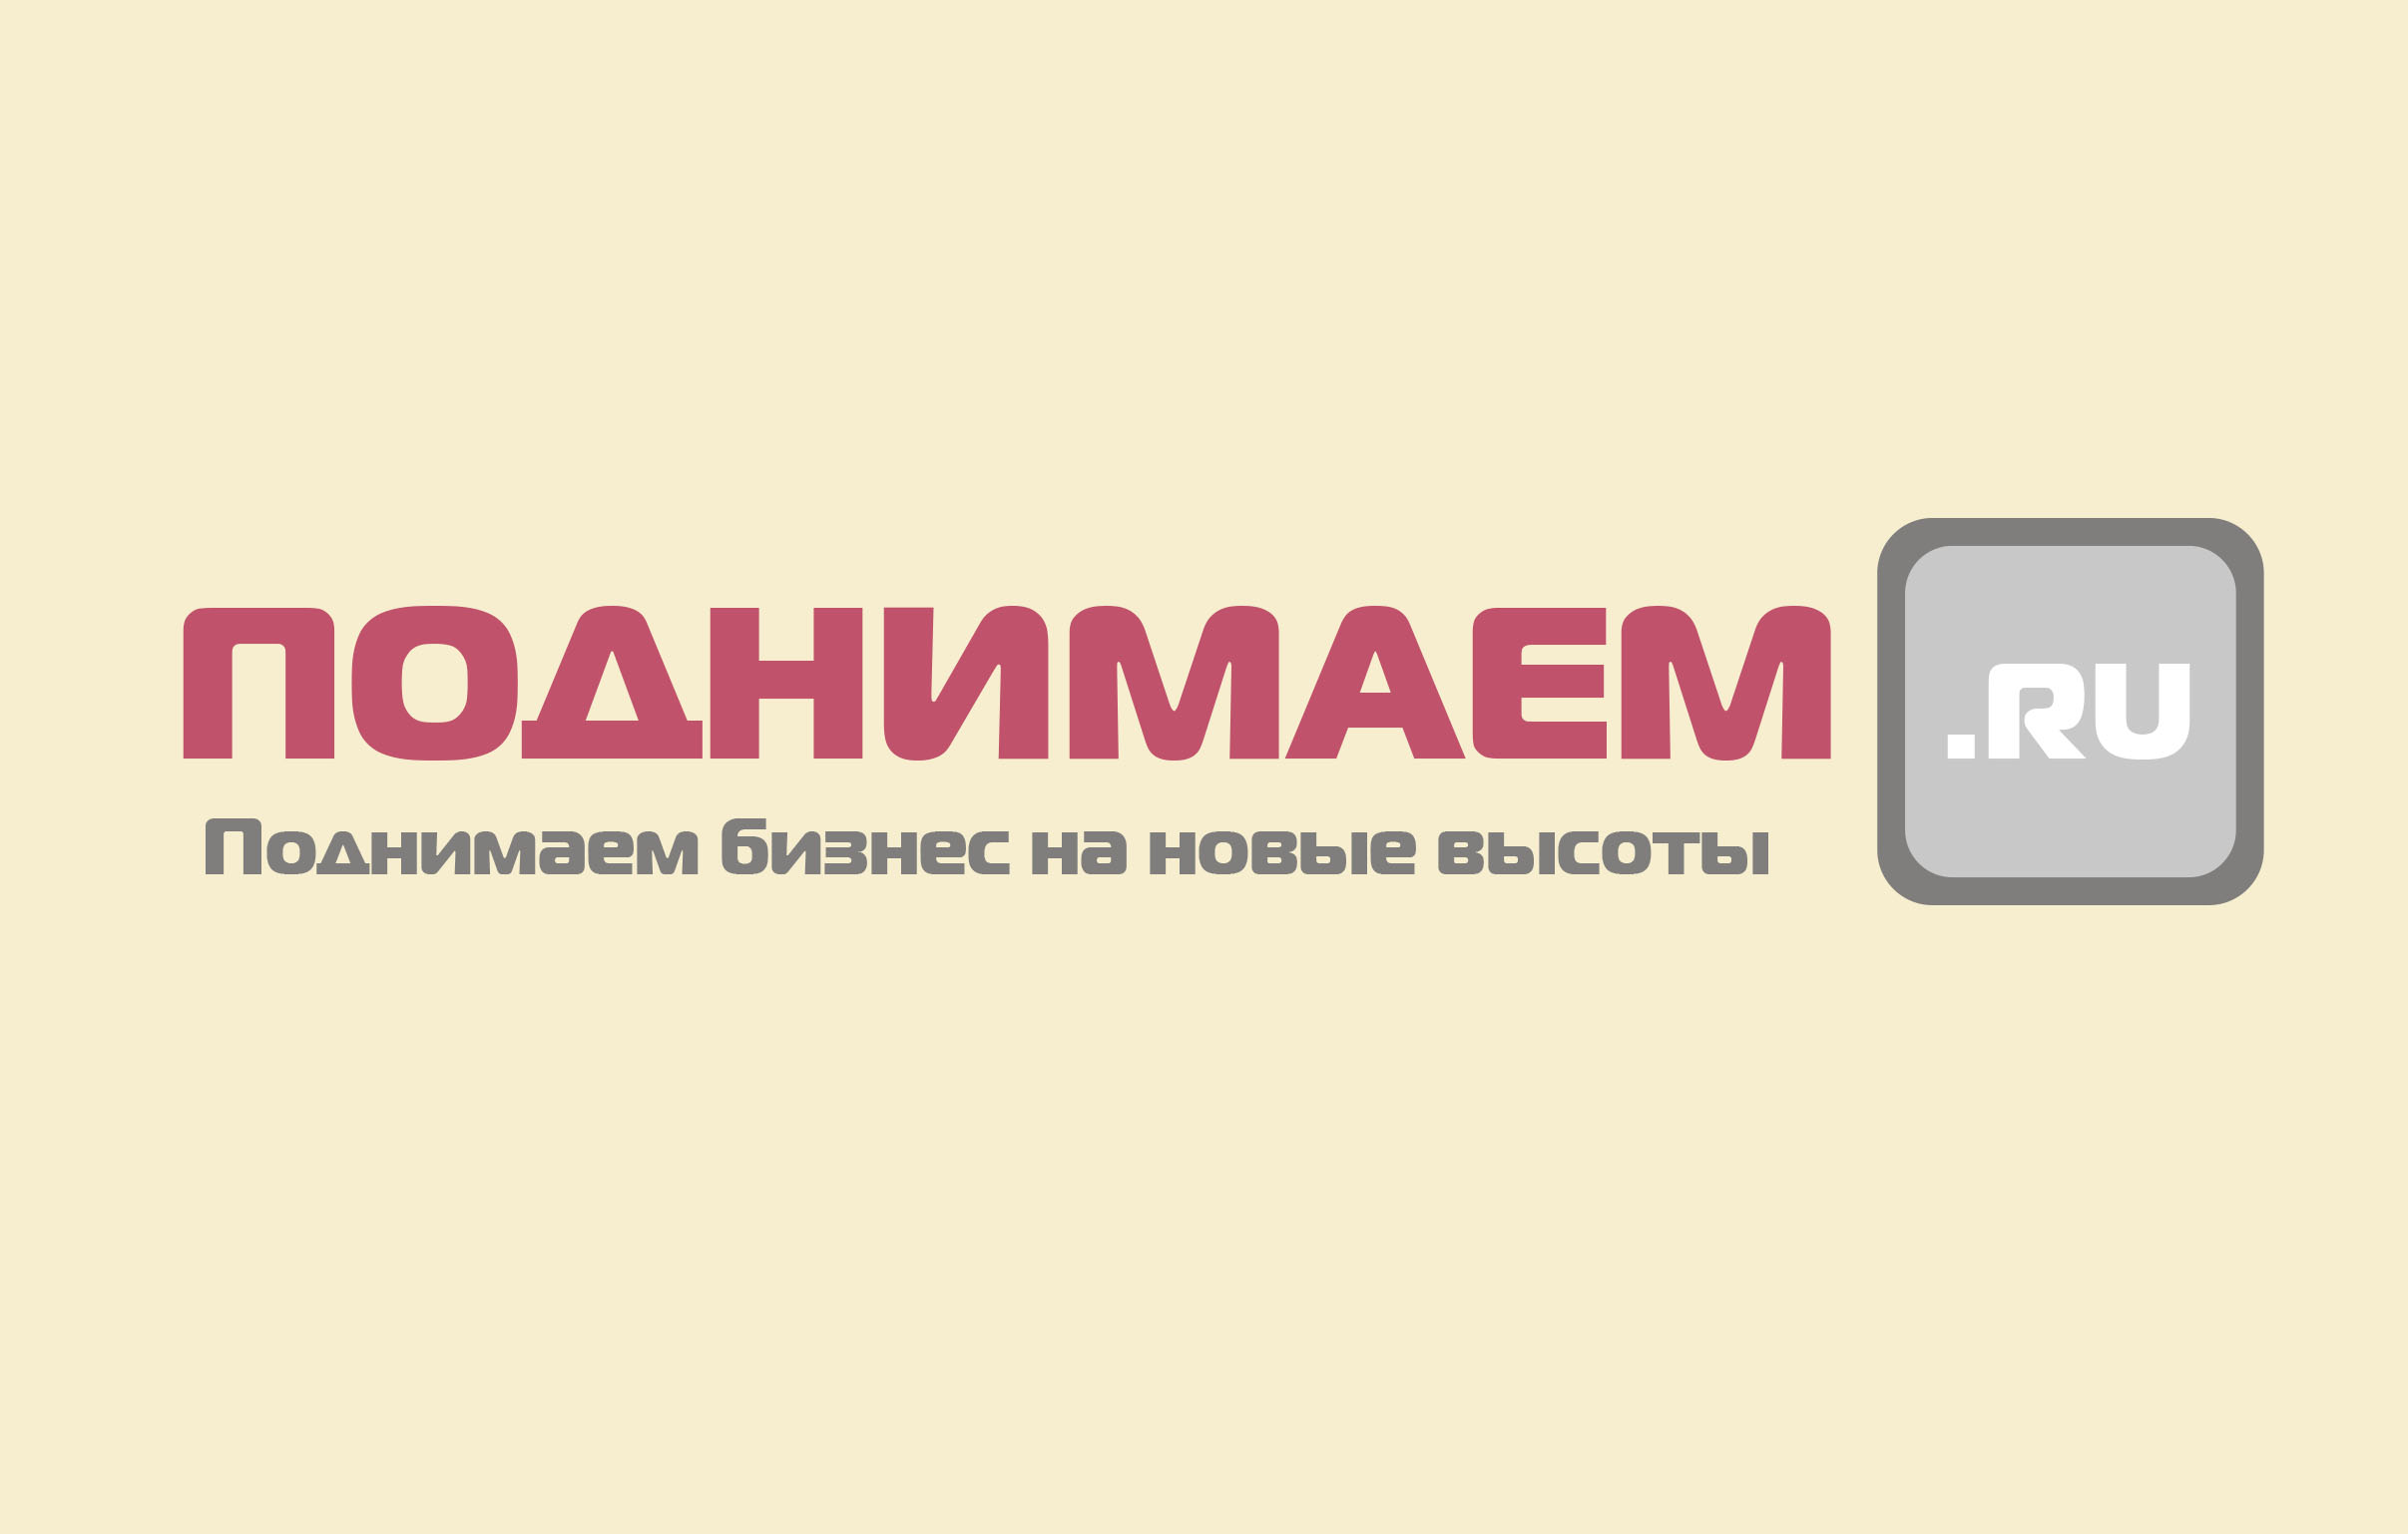 Разработать логотип + визитку + логотип для печати ООО +++ фото f_416554a1a14e1e72.jpg